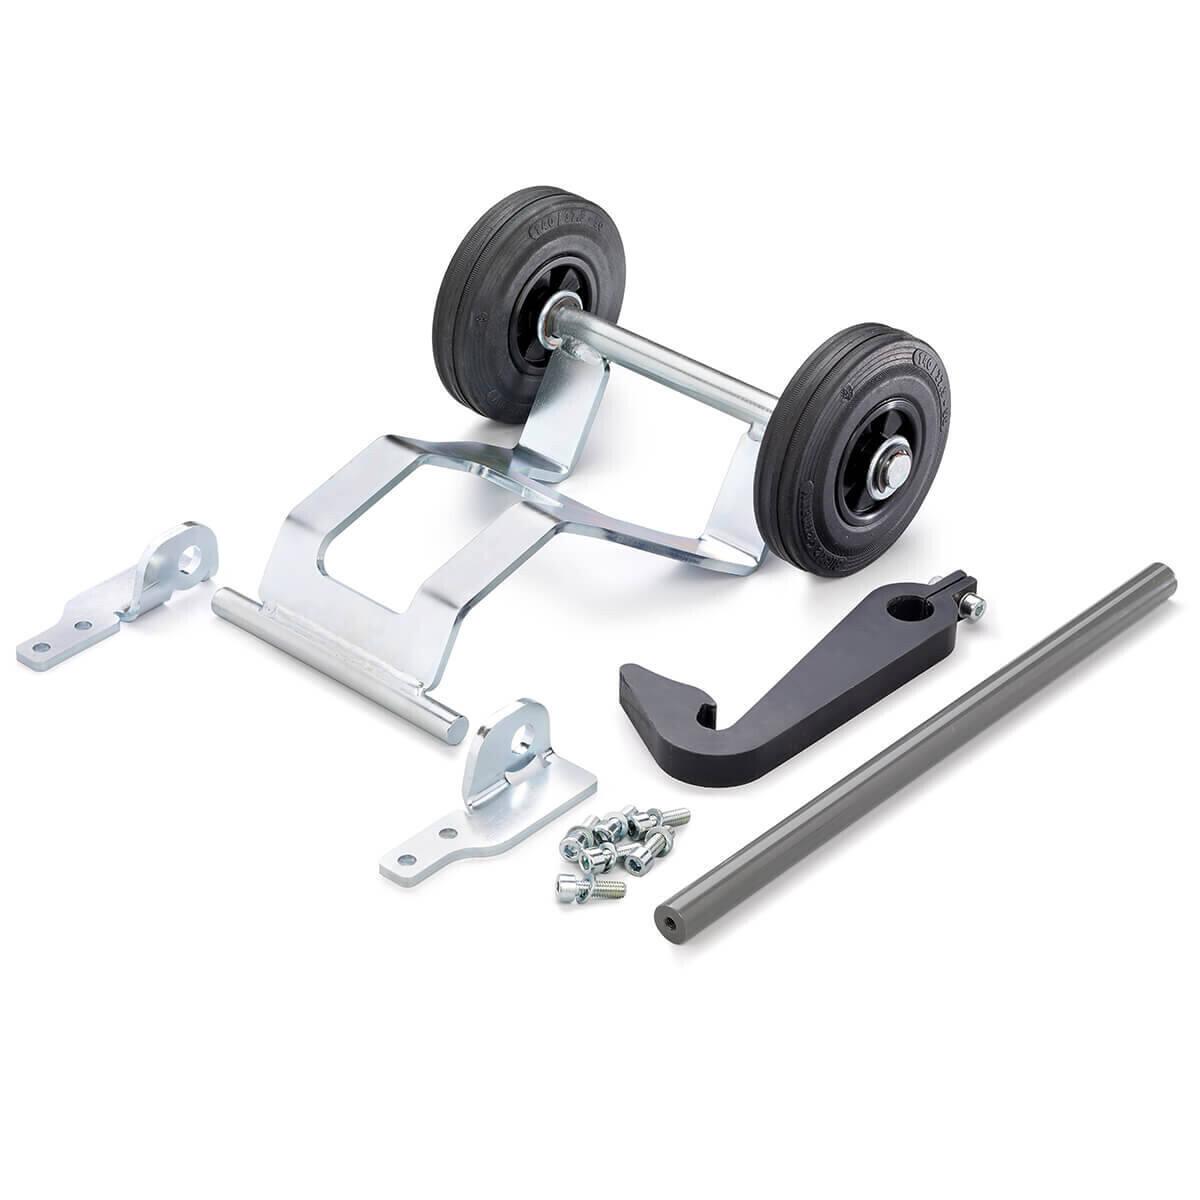 wacker neuson Wheel kit for WP 1540 & WP 1550 premium vibratory plate